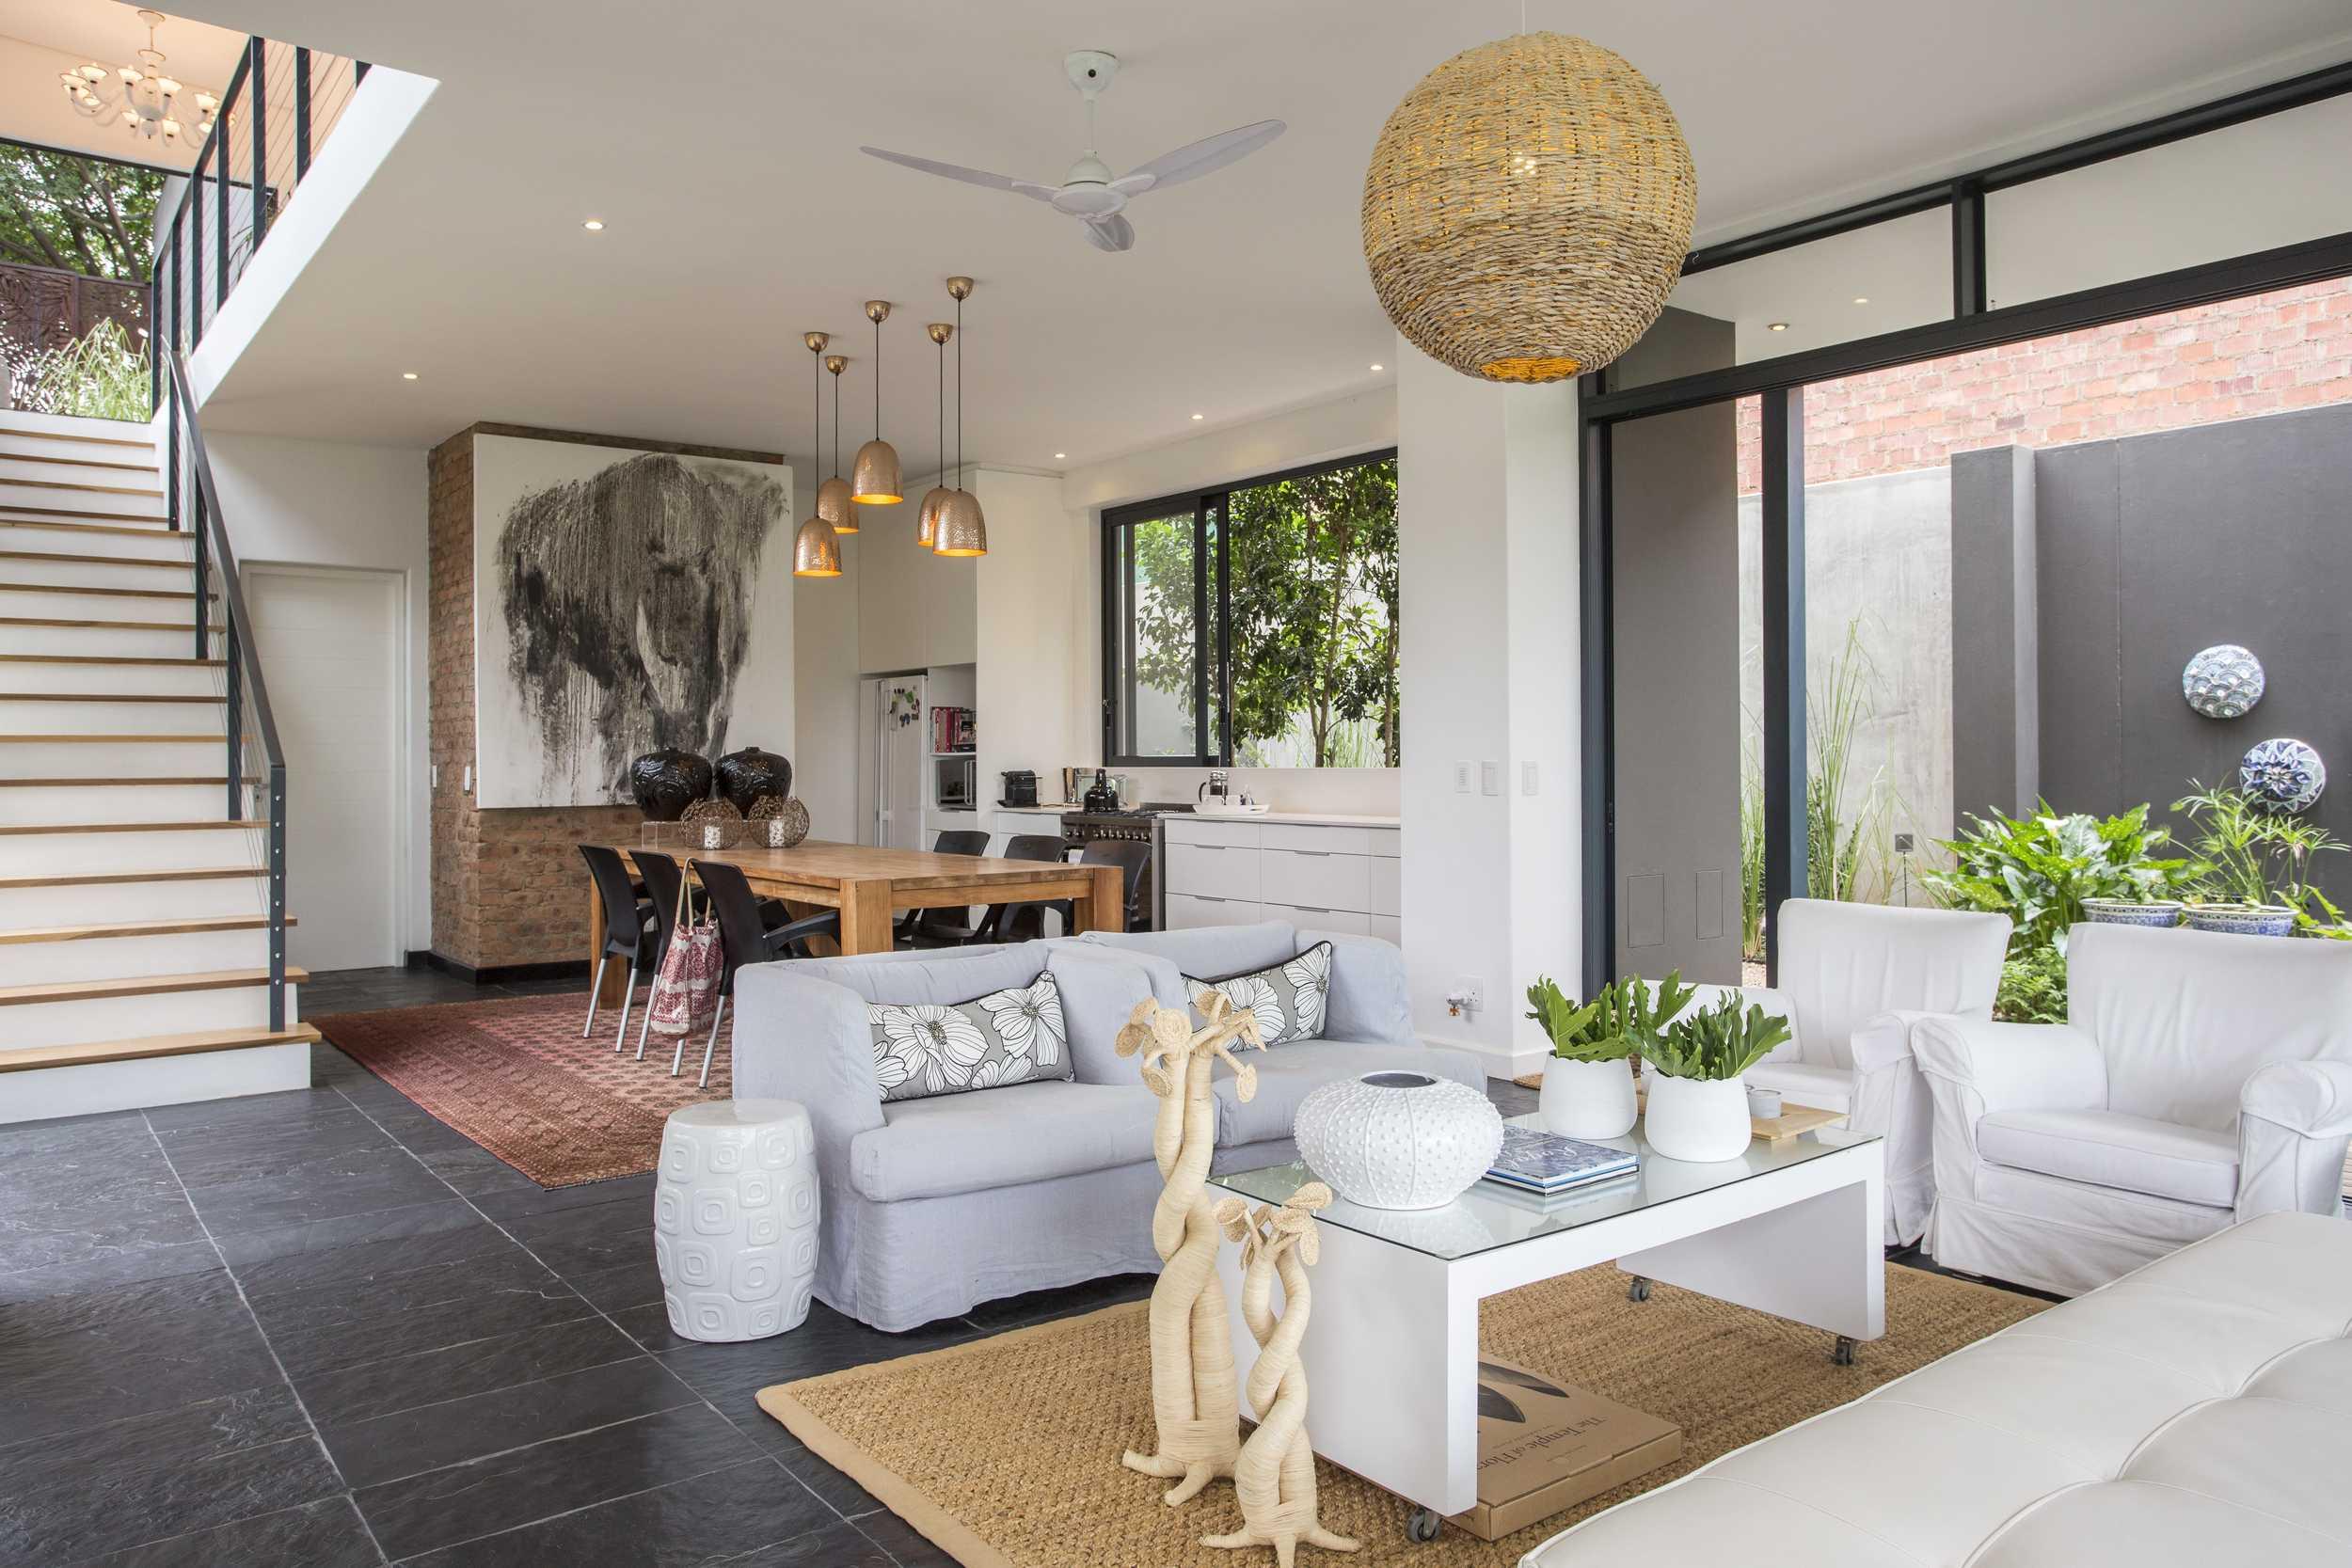 julia-rutherfoord-architect-dunkirk-estate-2014-03.jpg